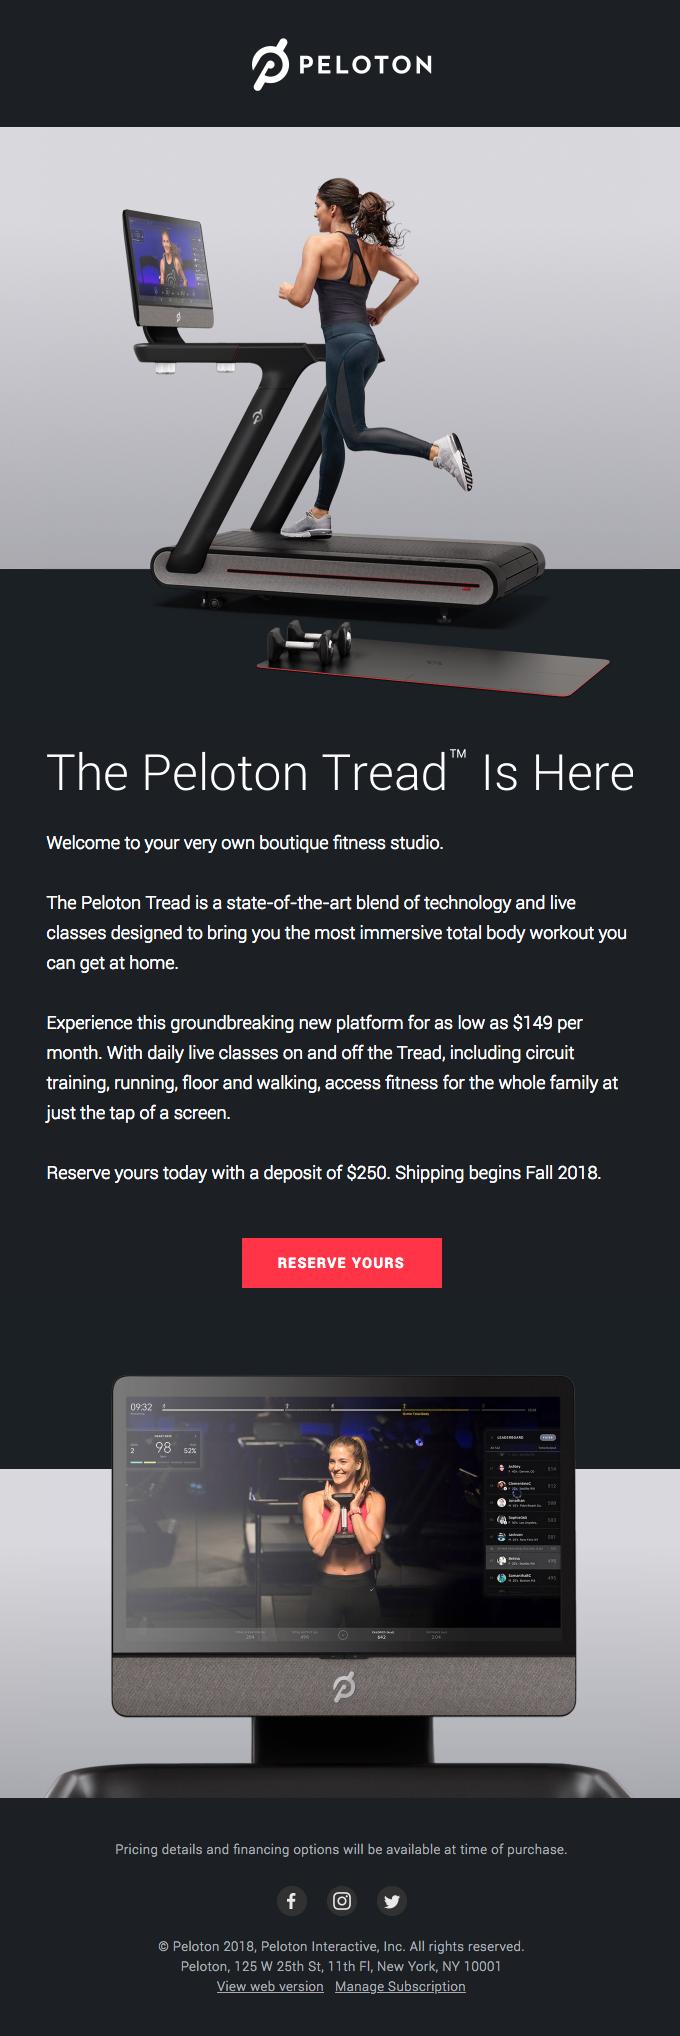 Introducing the Peloton Tread™